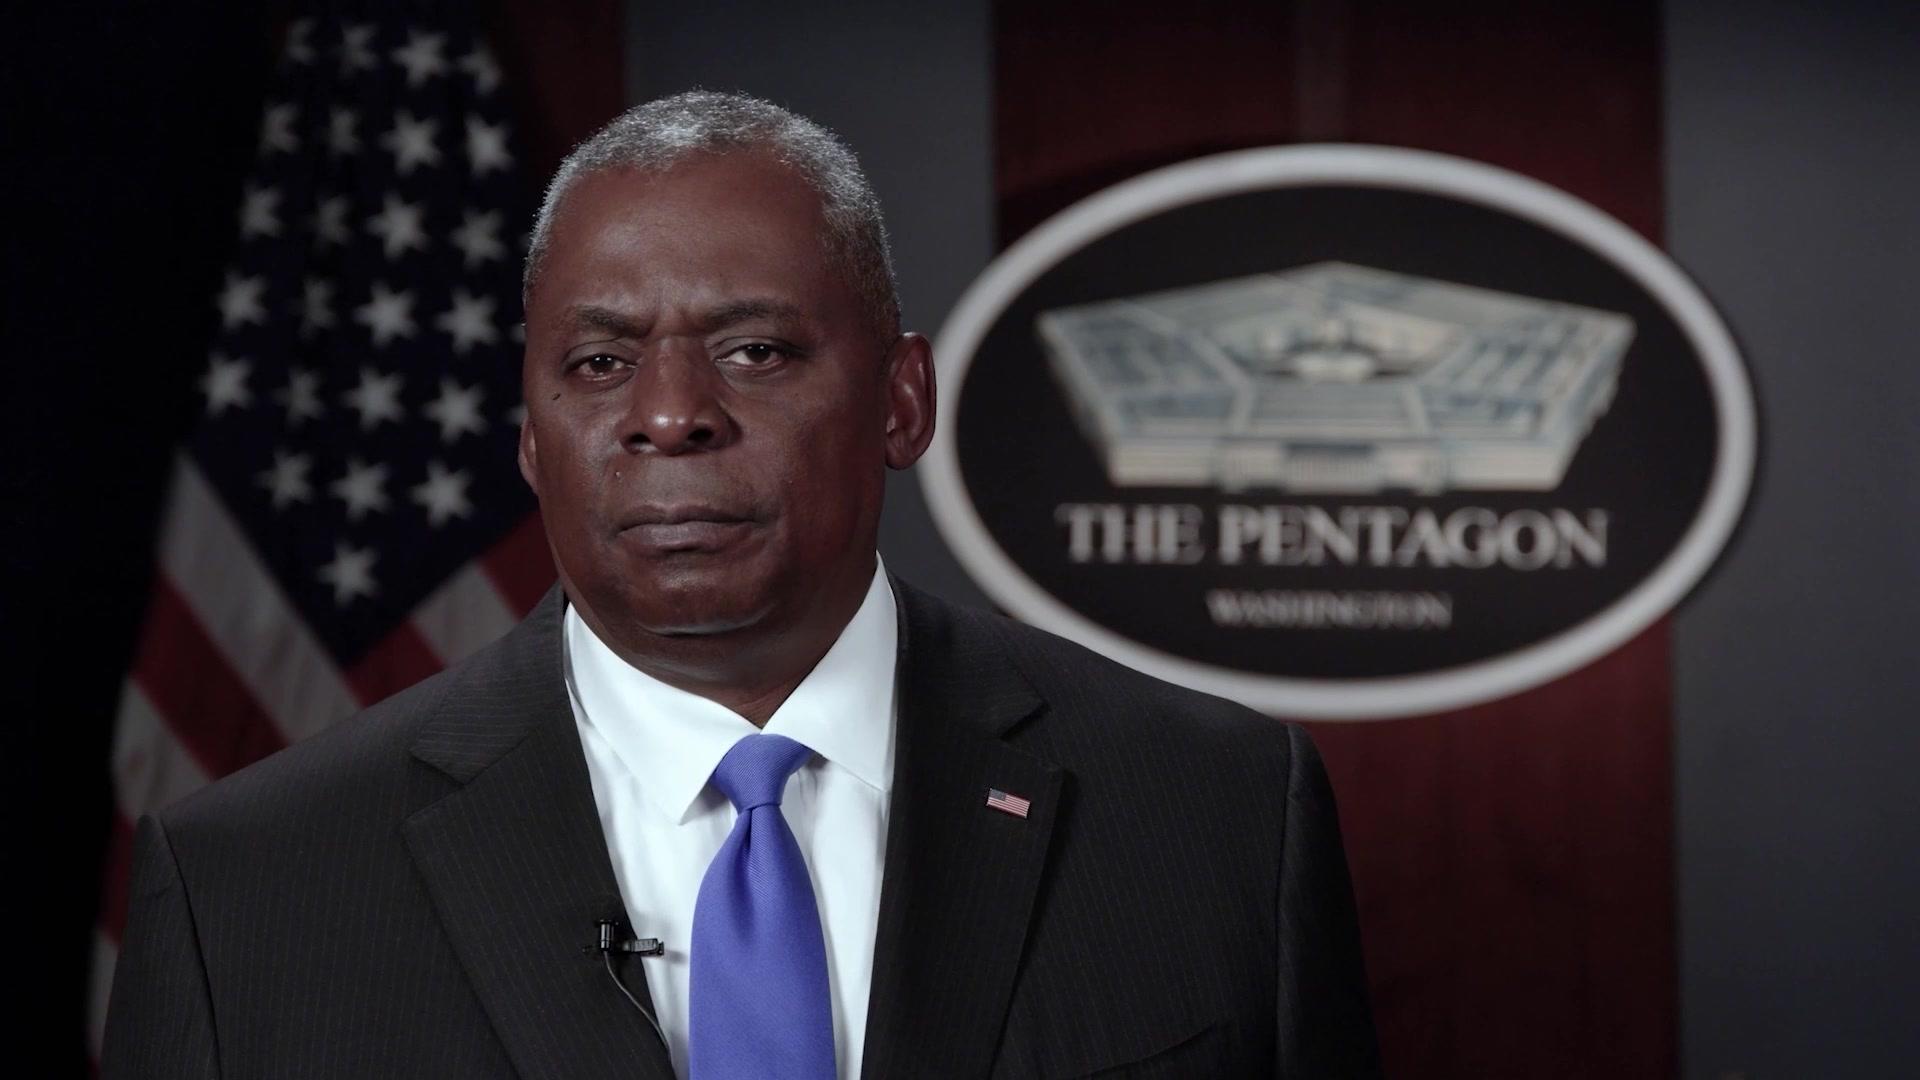 Secretary of Defense Lloyd J. Austin III speaks to the force on the 20th anniversary of Sept. 11, 2001.